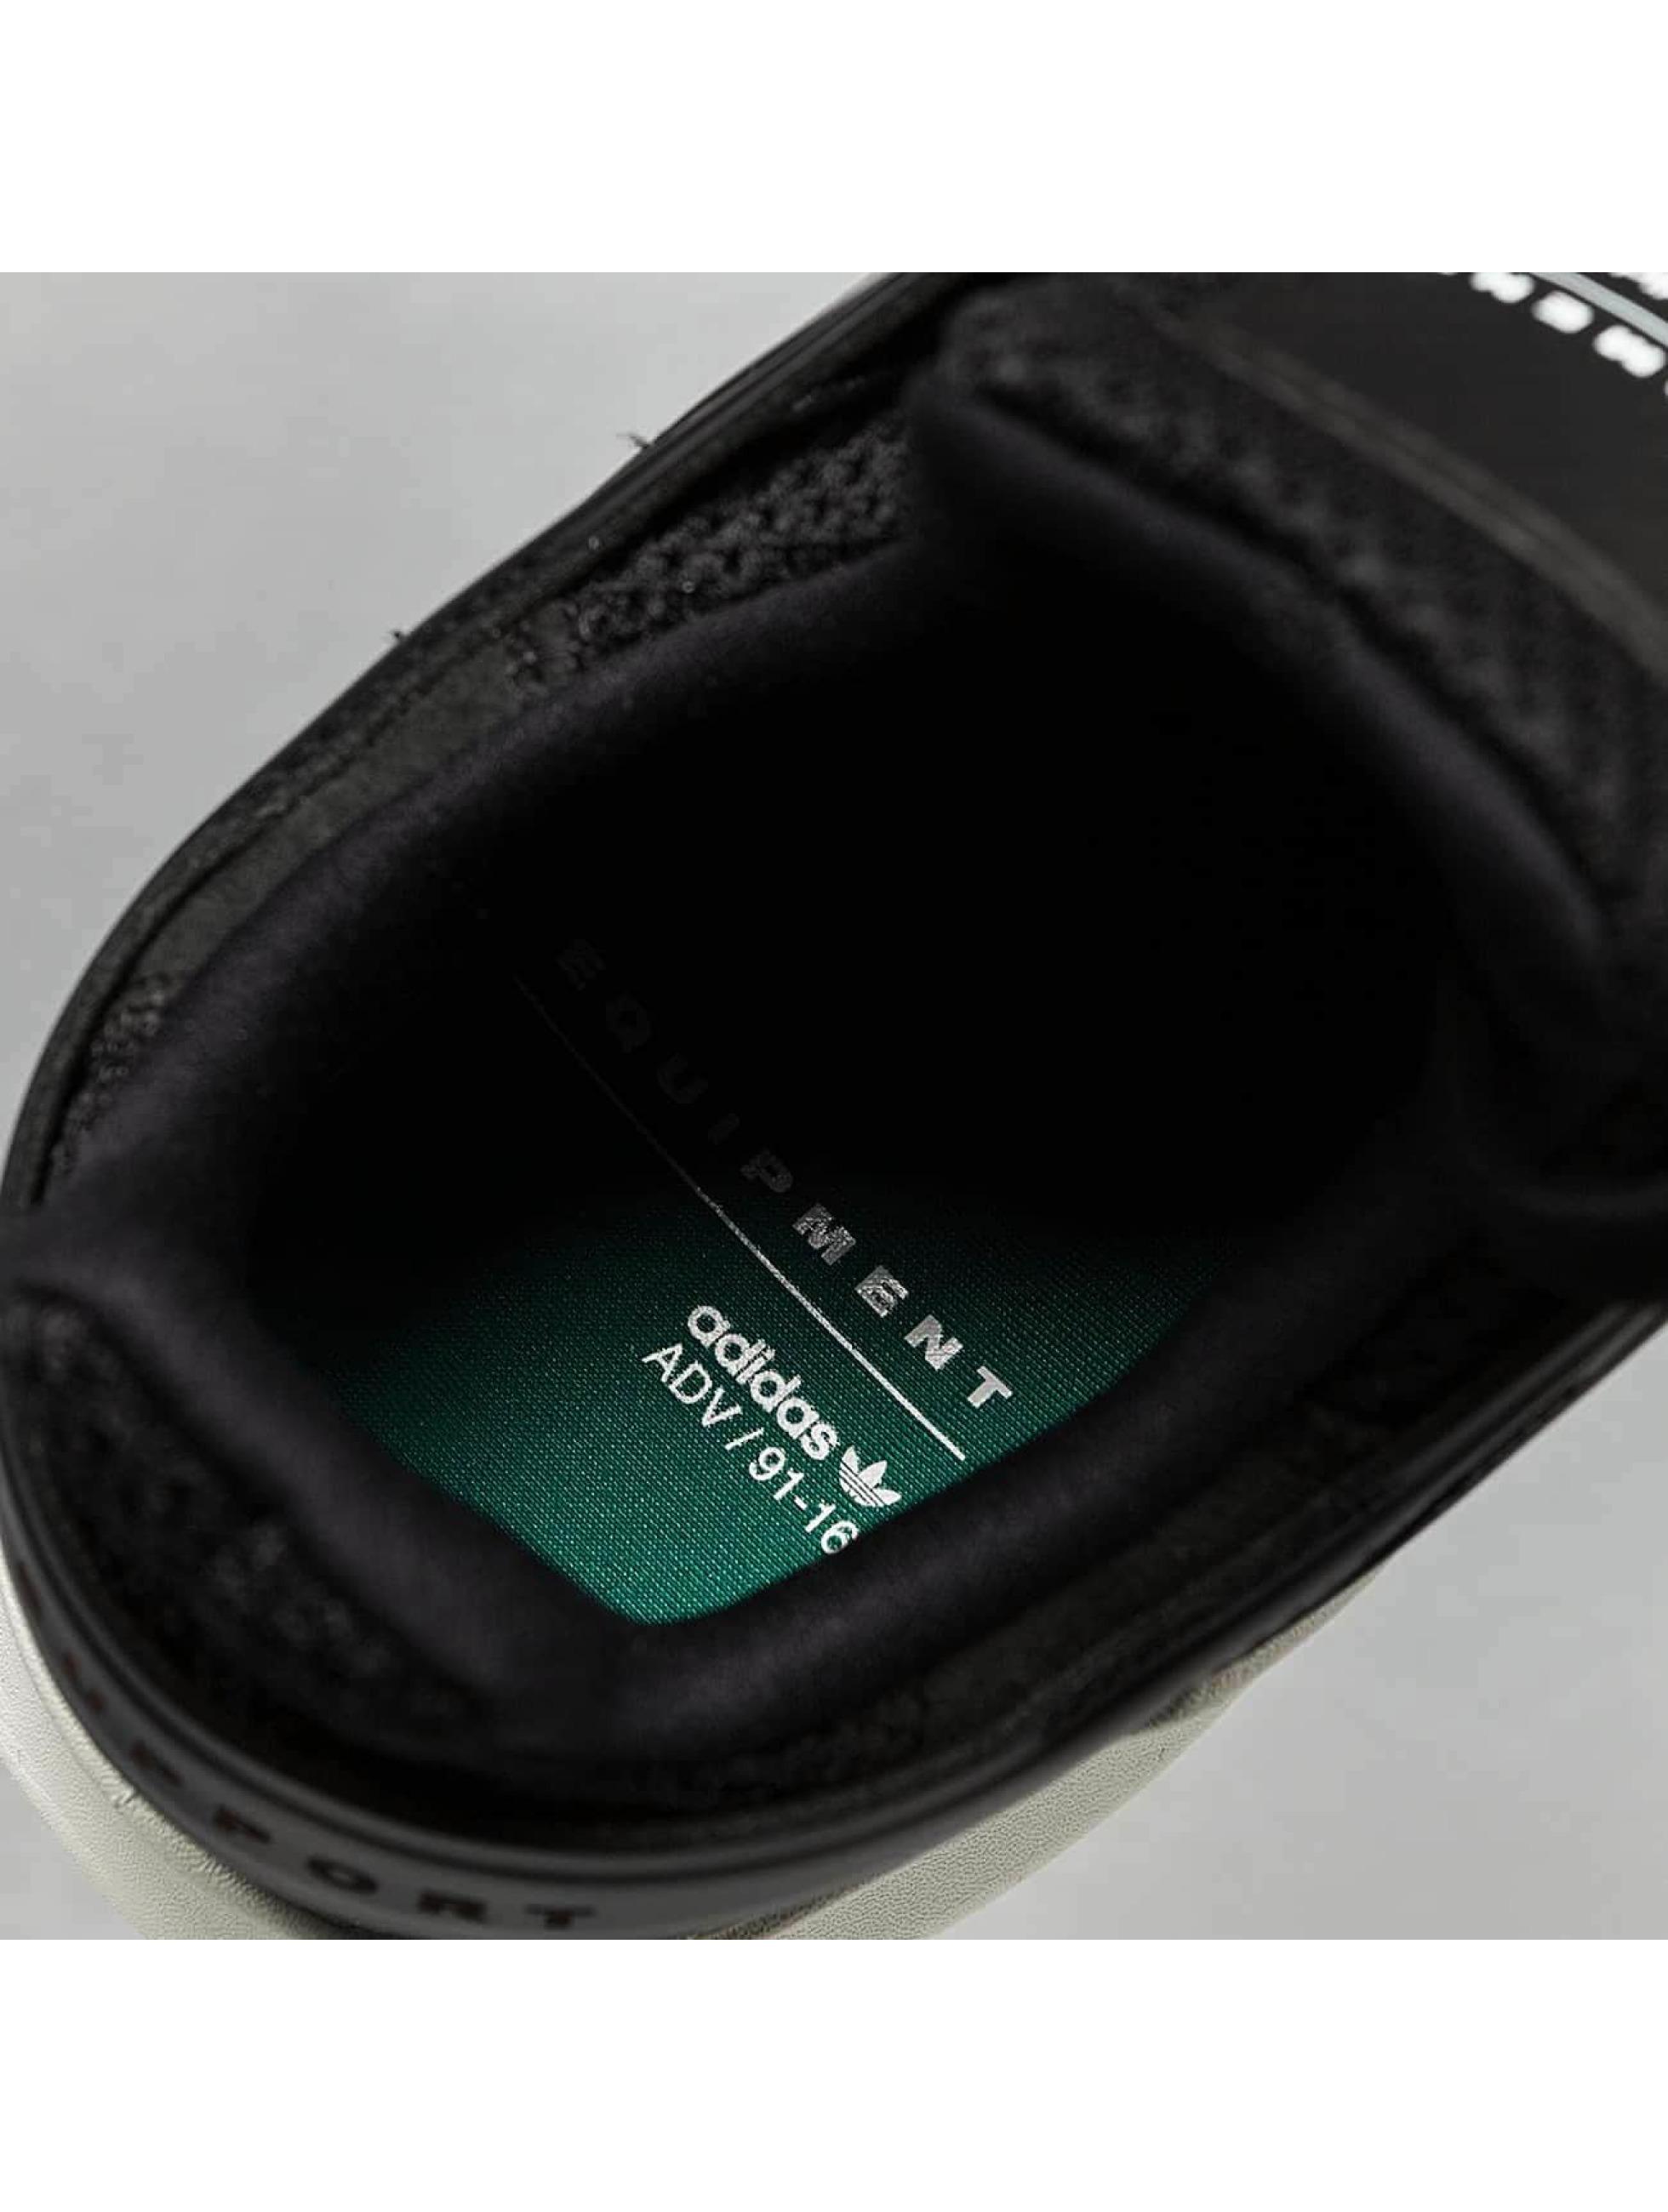 adidas originals Baskets Equipment Support ADV noir